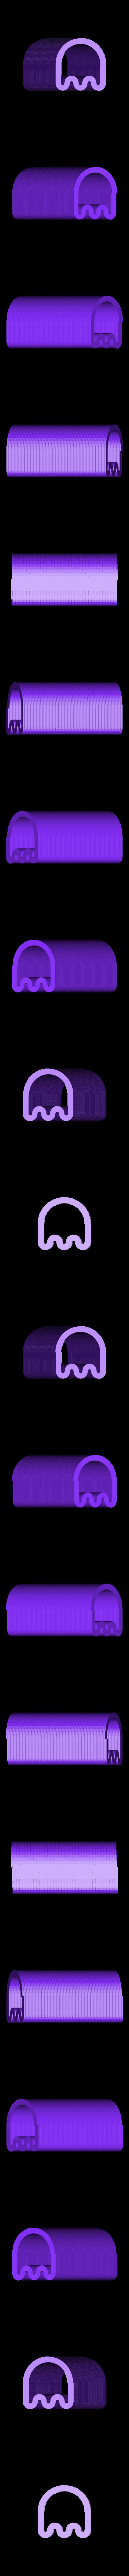 PacManGhostSlinky.stl Download free STL file Slinkies • Template to 3D print, Ristrorg